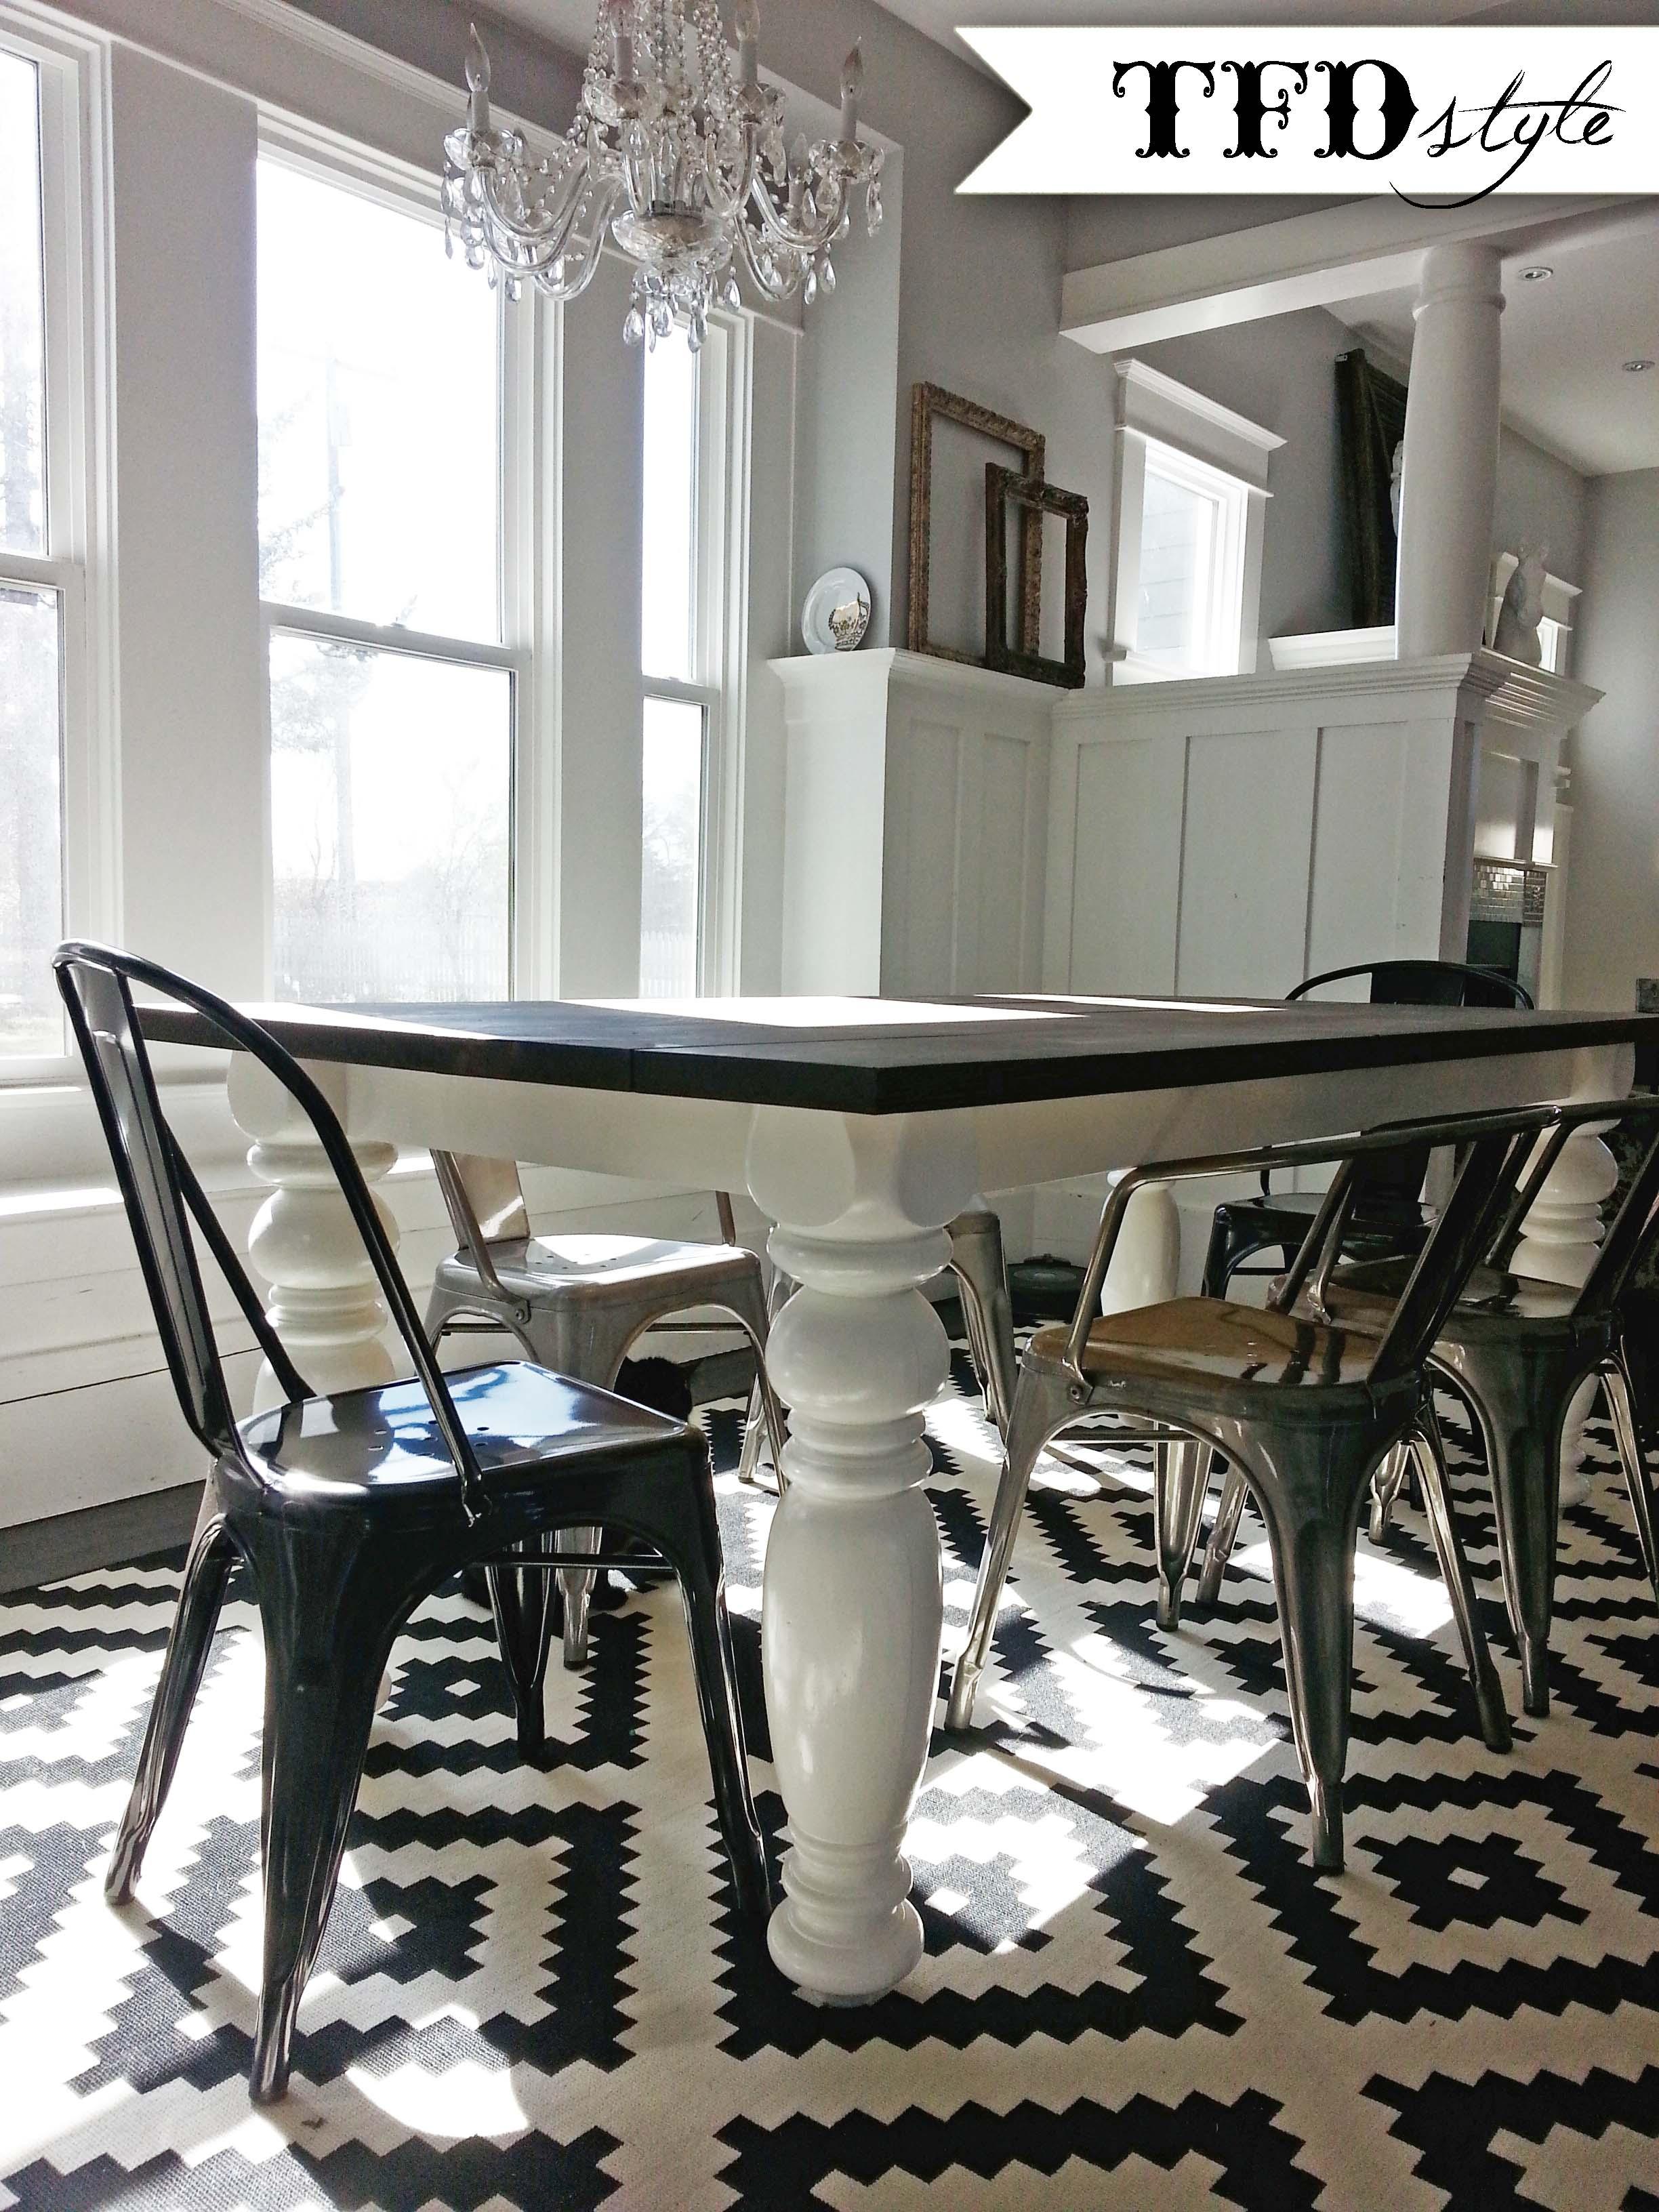 diy farm style dining room table target kitchen chairs Mar 12 DIY Farmhouse Dining Room Table